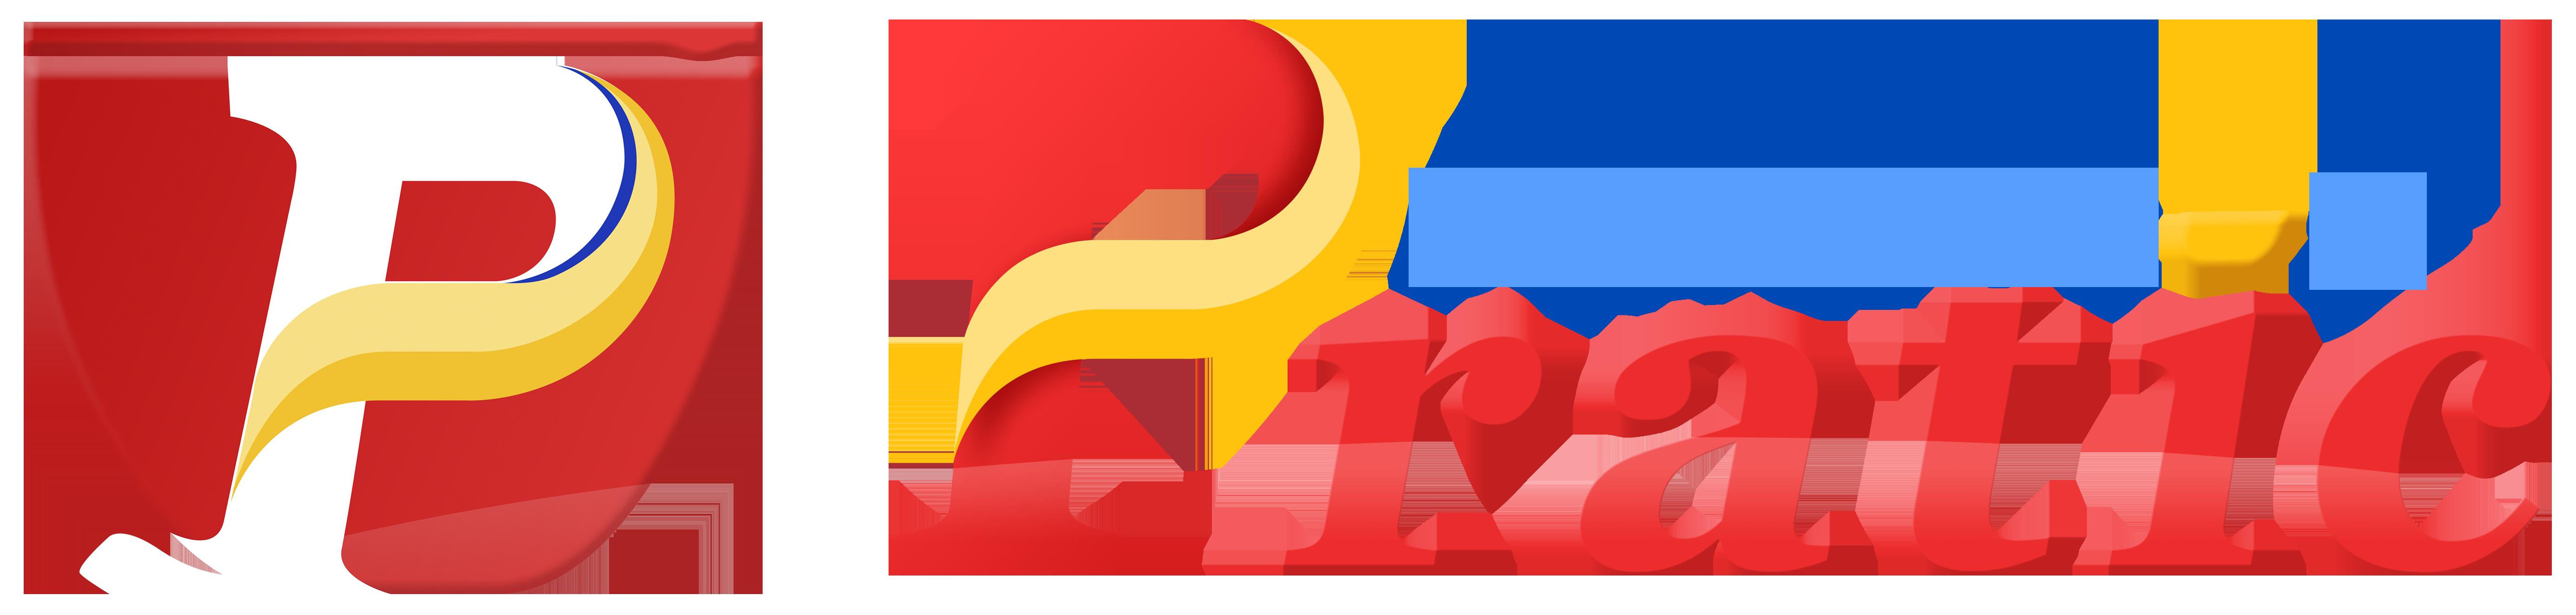 Pratic Plásticos Utilidades Domésticas Potes